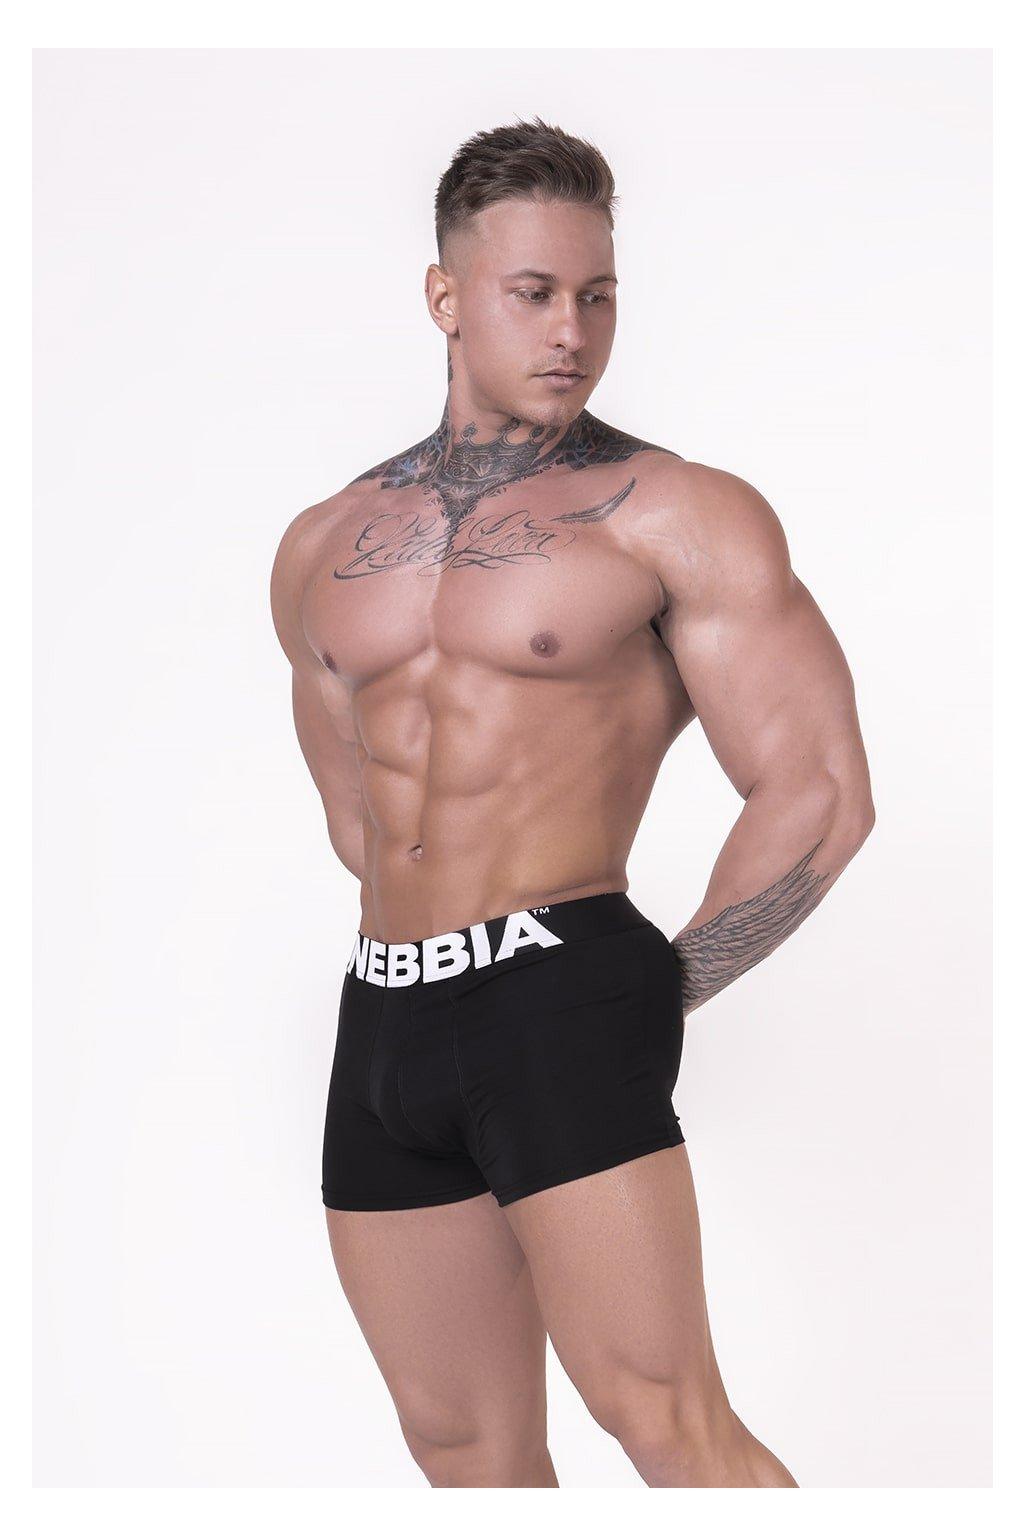 c440fc73e LuxBody - NEBBIA fitness oblečenie